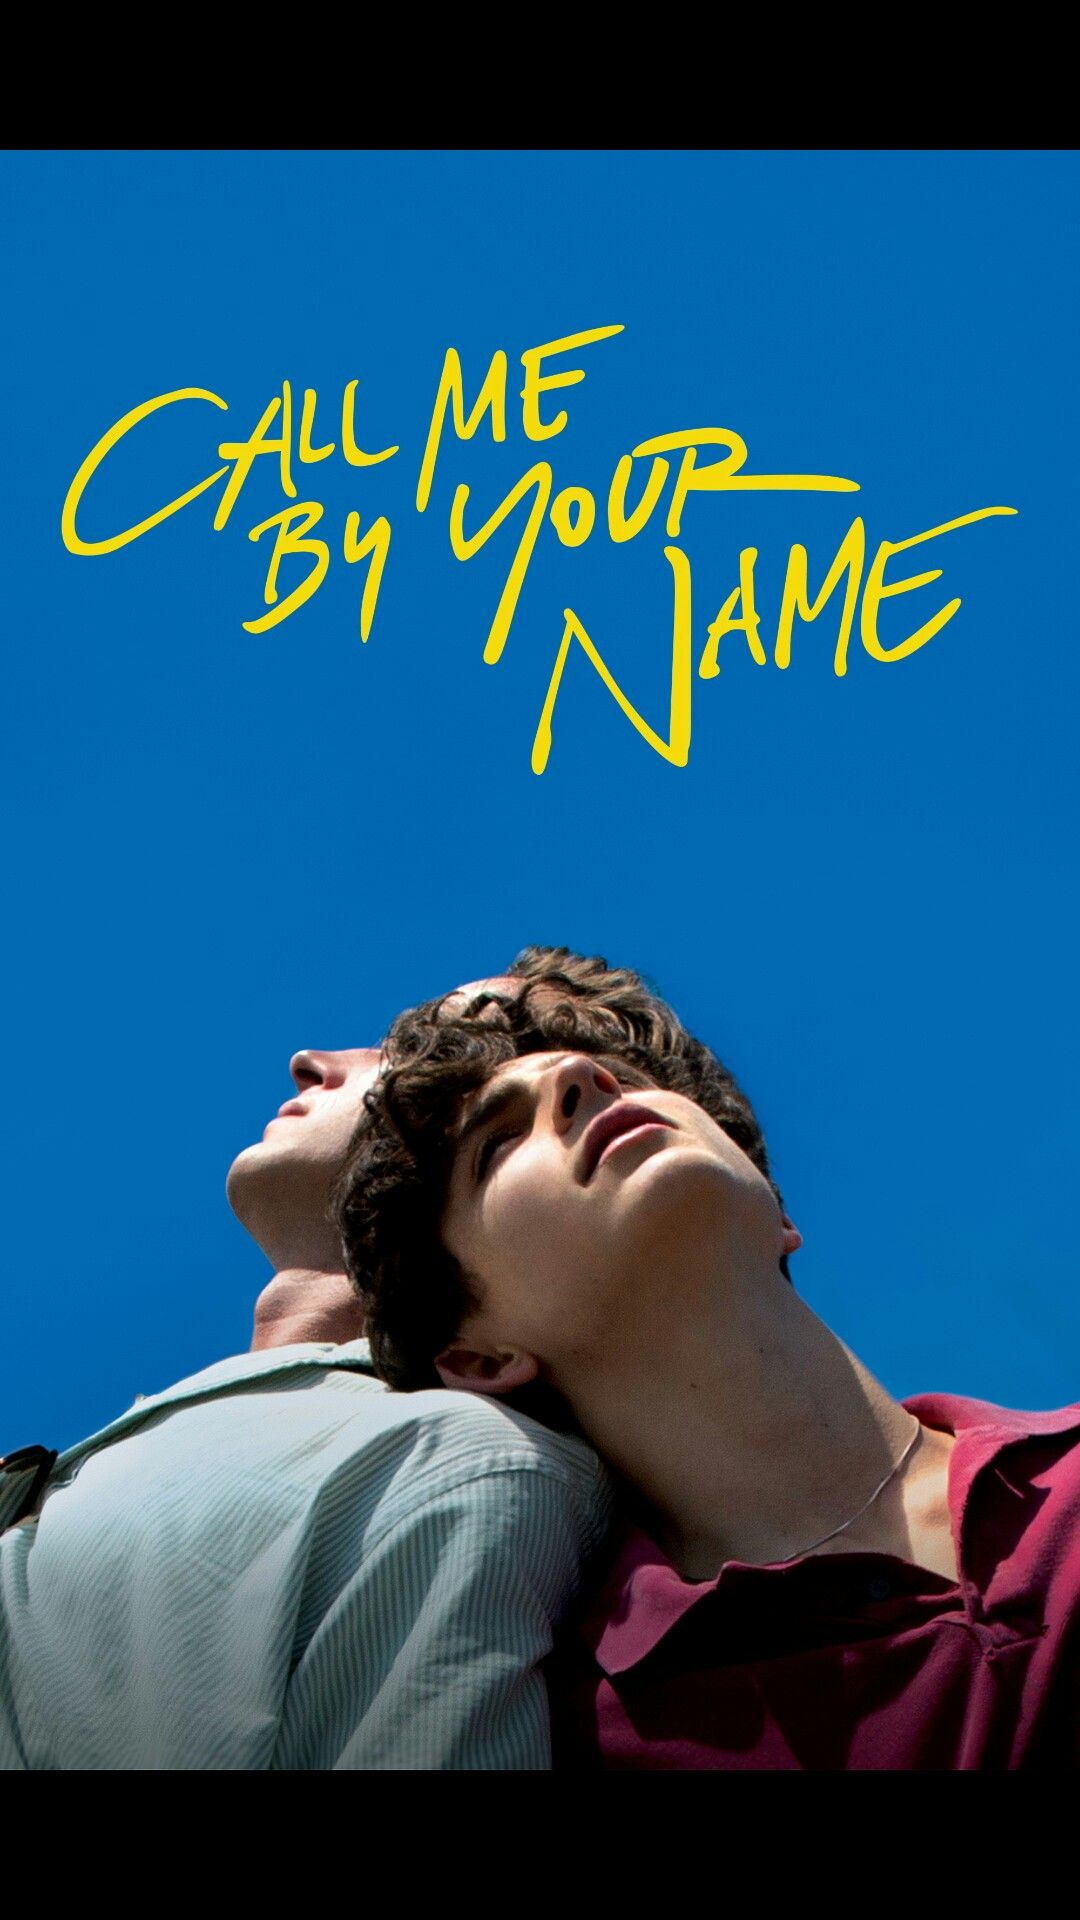 Call Me By Your Name Romantischer Film Romantische Filme Beliebte Filme